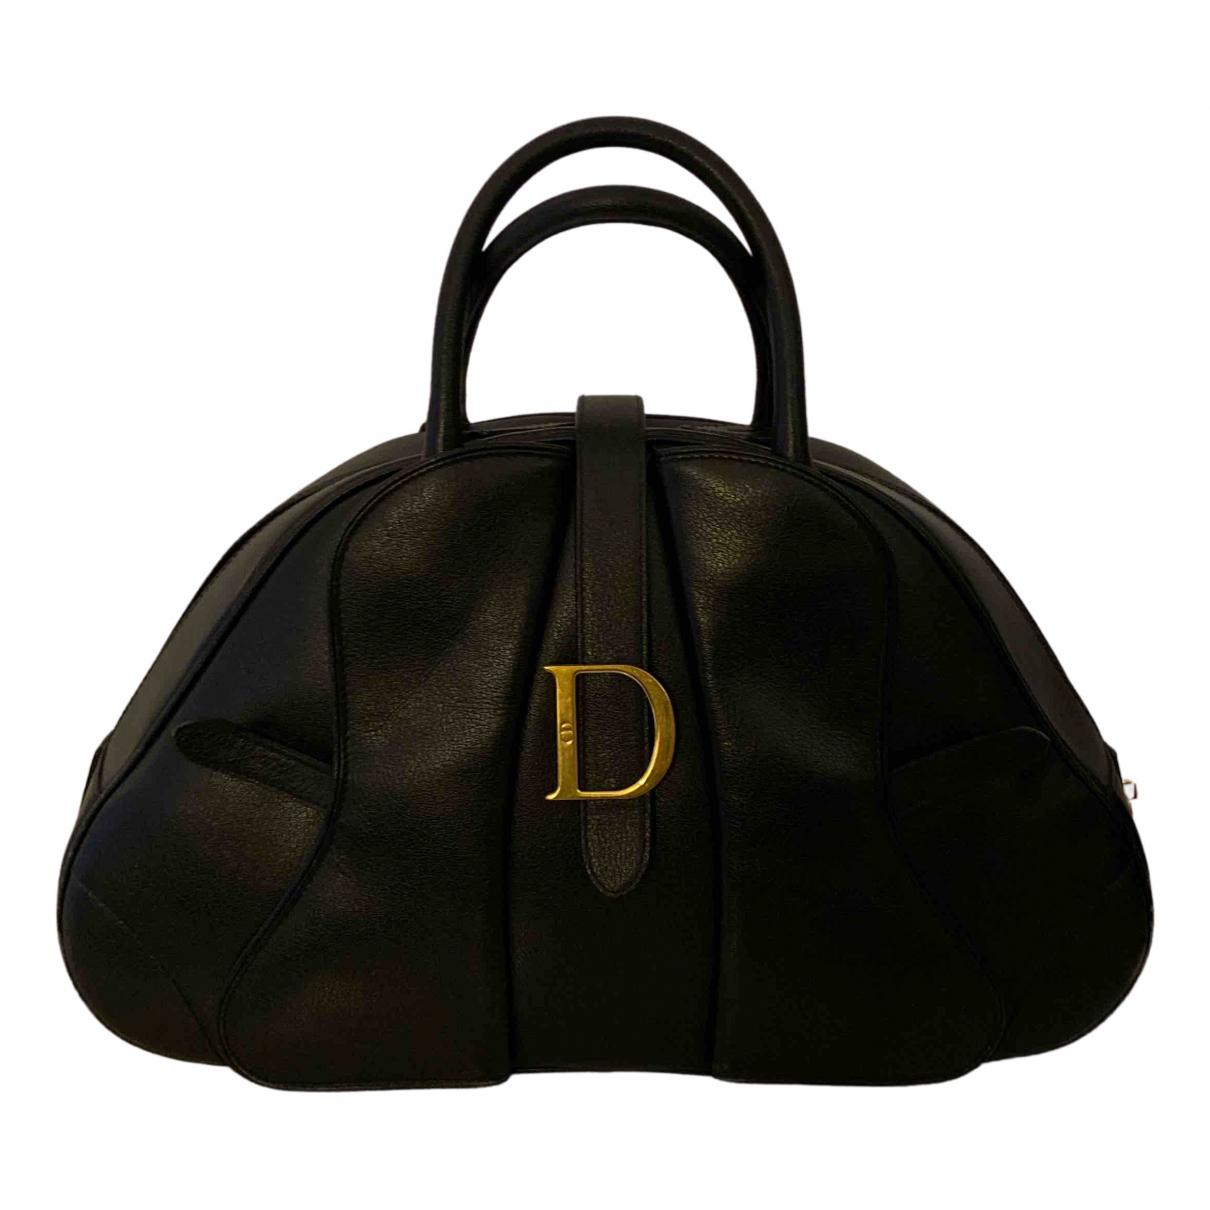 Dior Saddle Bowler Handtasche in  Schwarz Leder